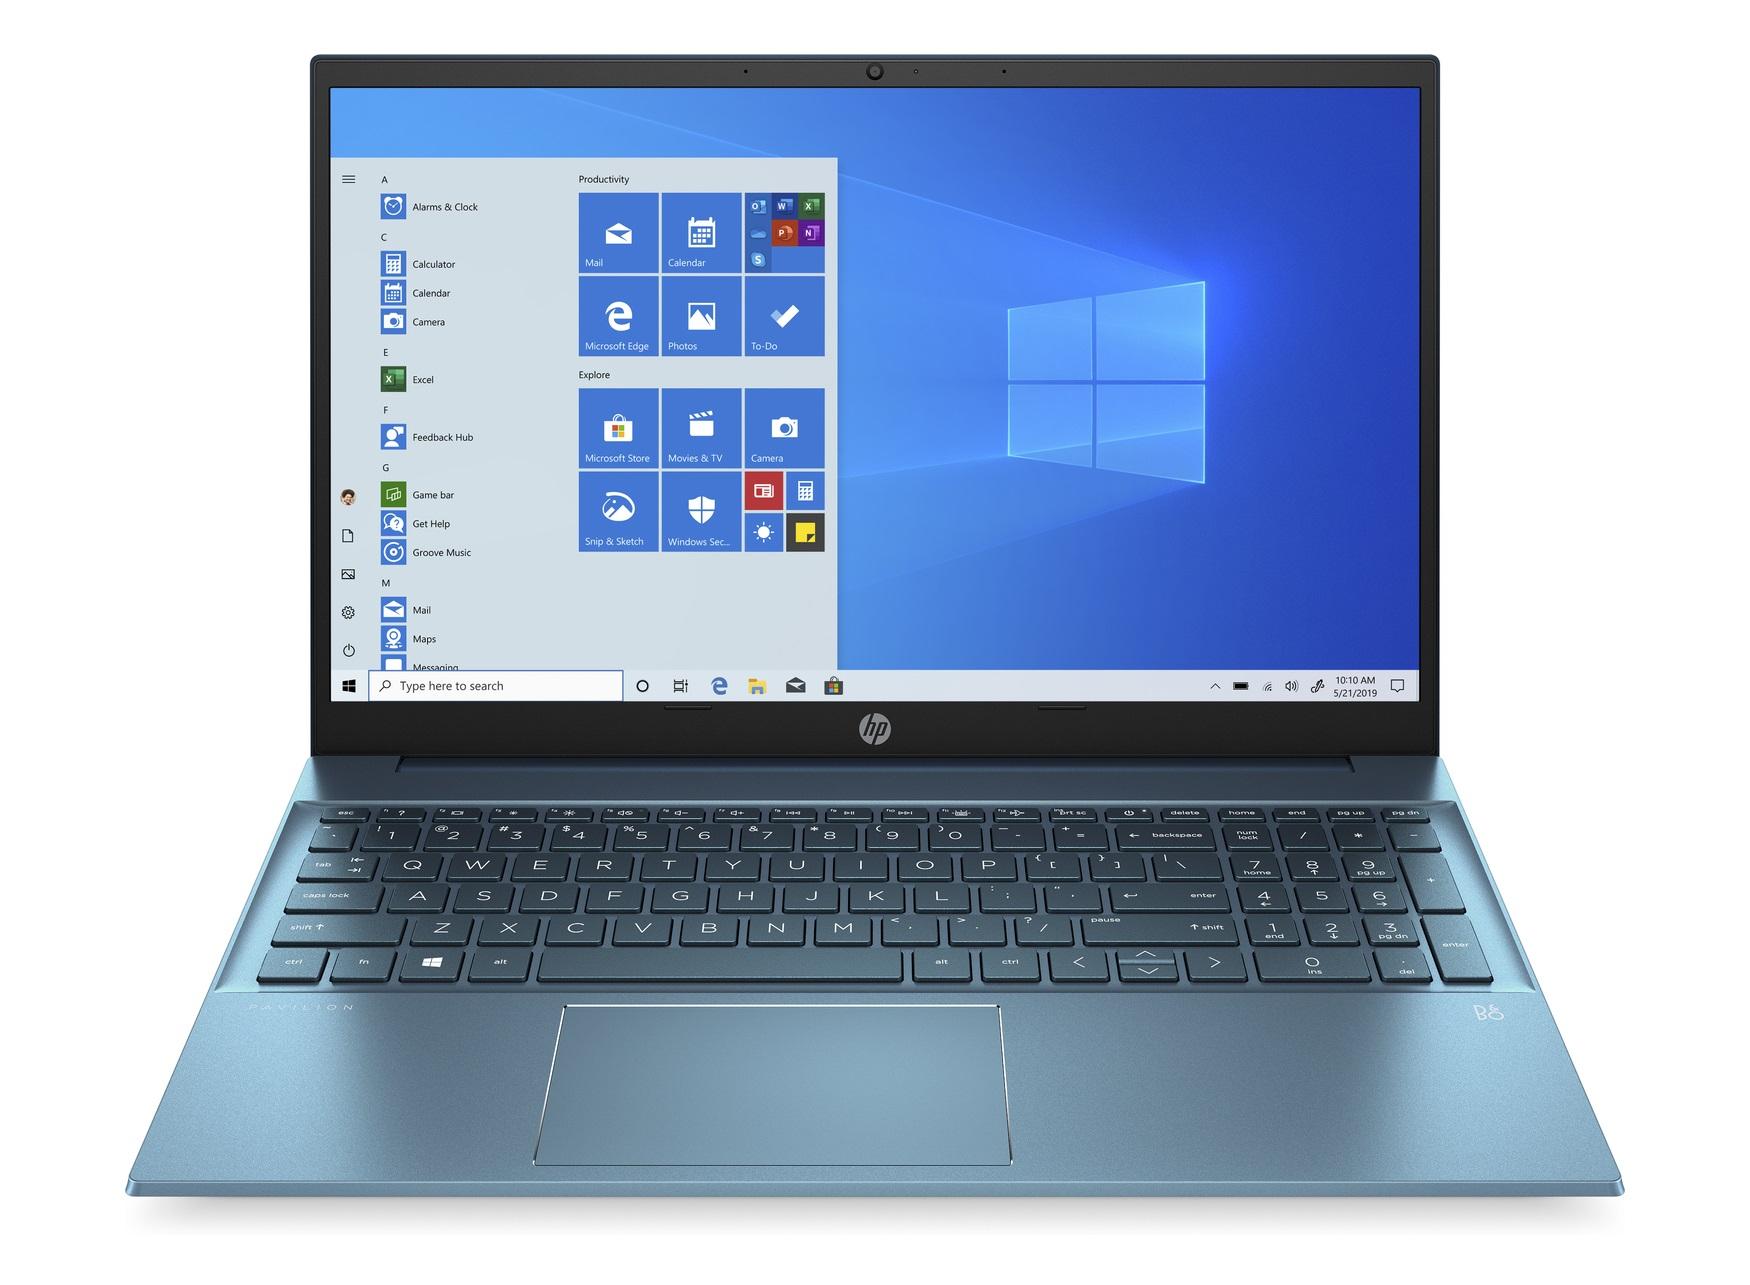 [Studenten] HP Pavilion mit AMD Ryzen™ 7 5700U, blau, 15 Zoll, 16GB RAM, 1TB SSD